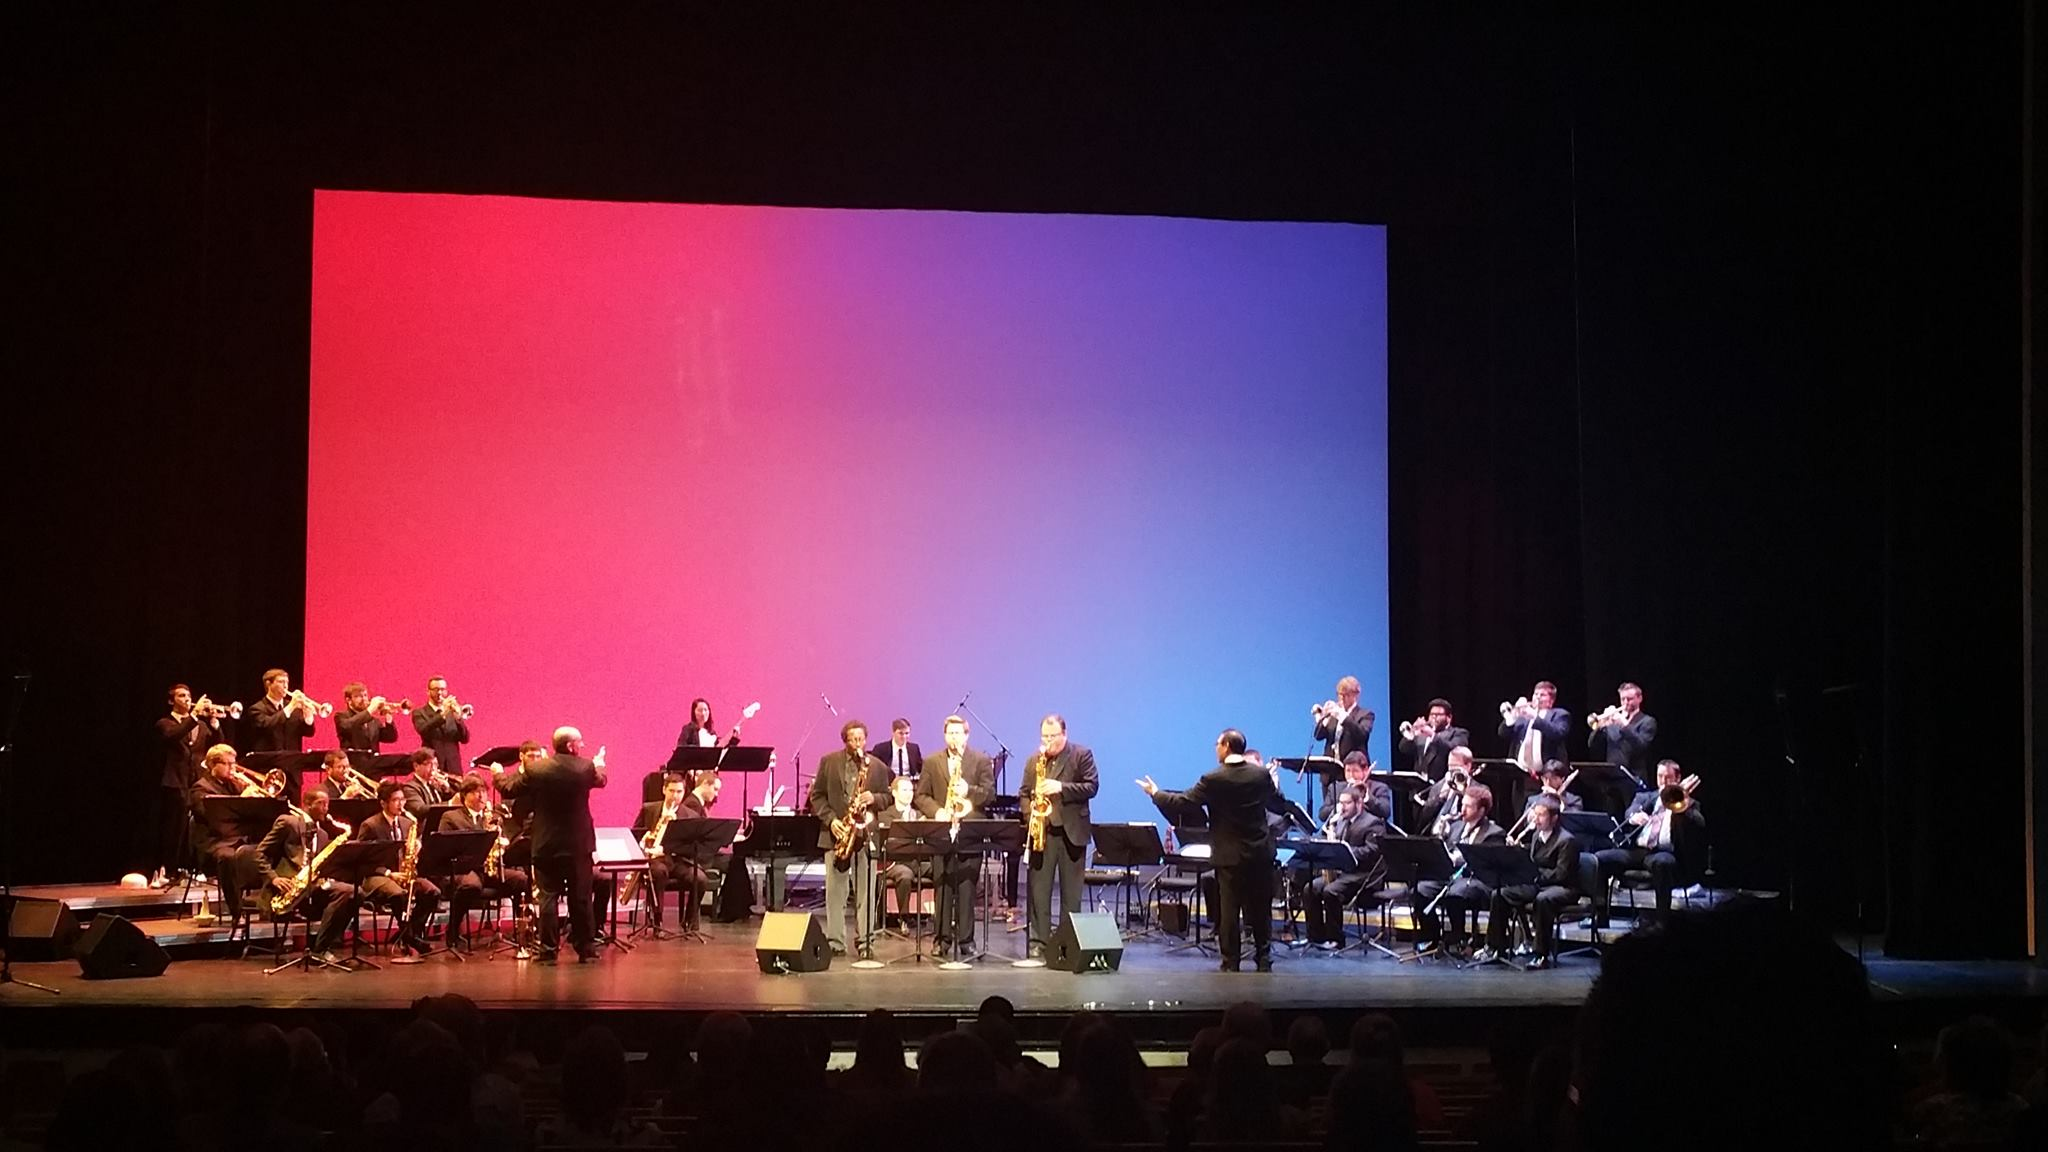 jazz ensemble performing on stage